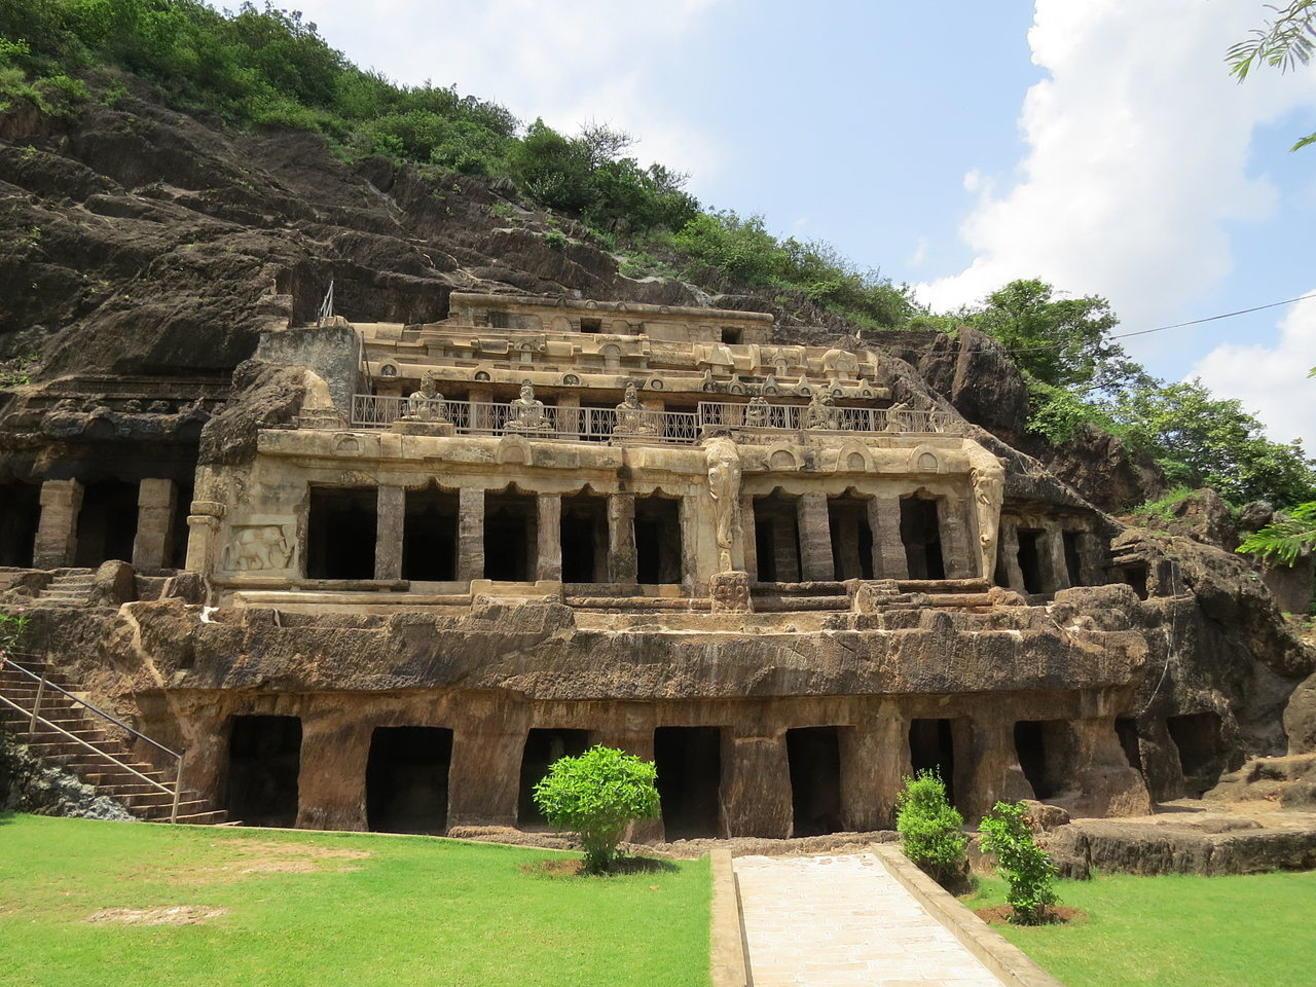 Undavalli Caves (Four Storeyed Rock-Cut Hindu Temples), Vijaywada